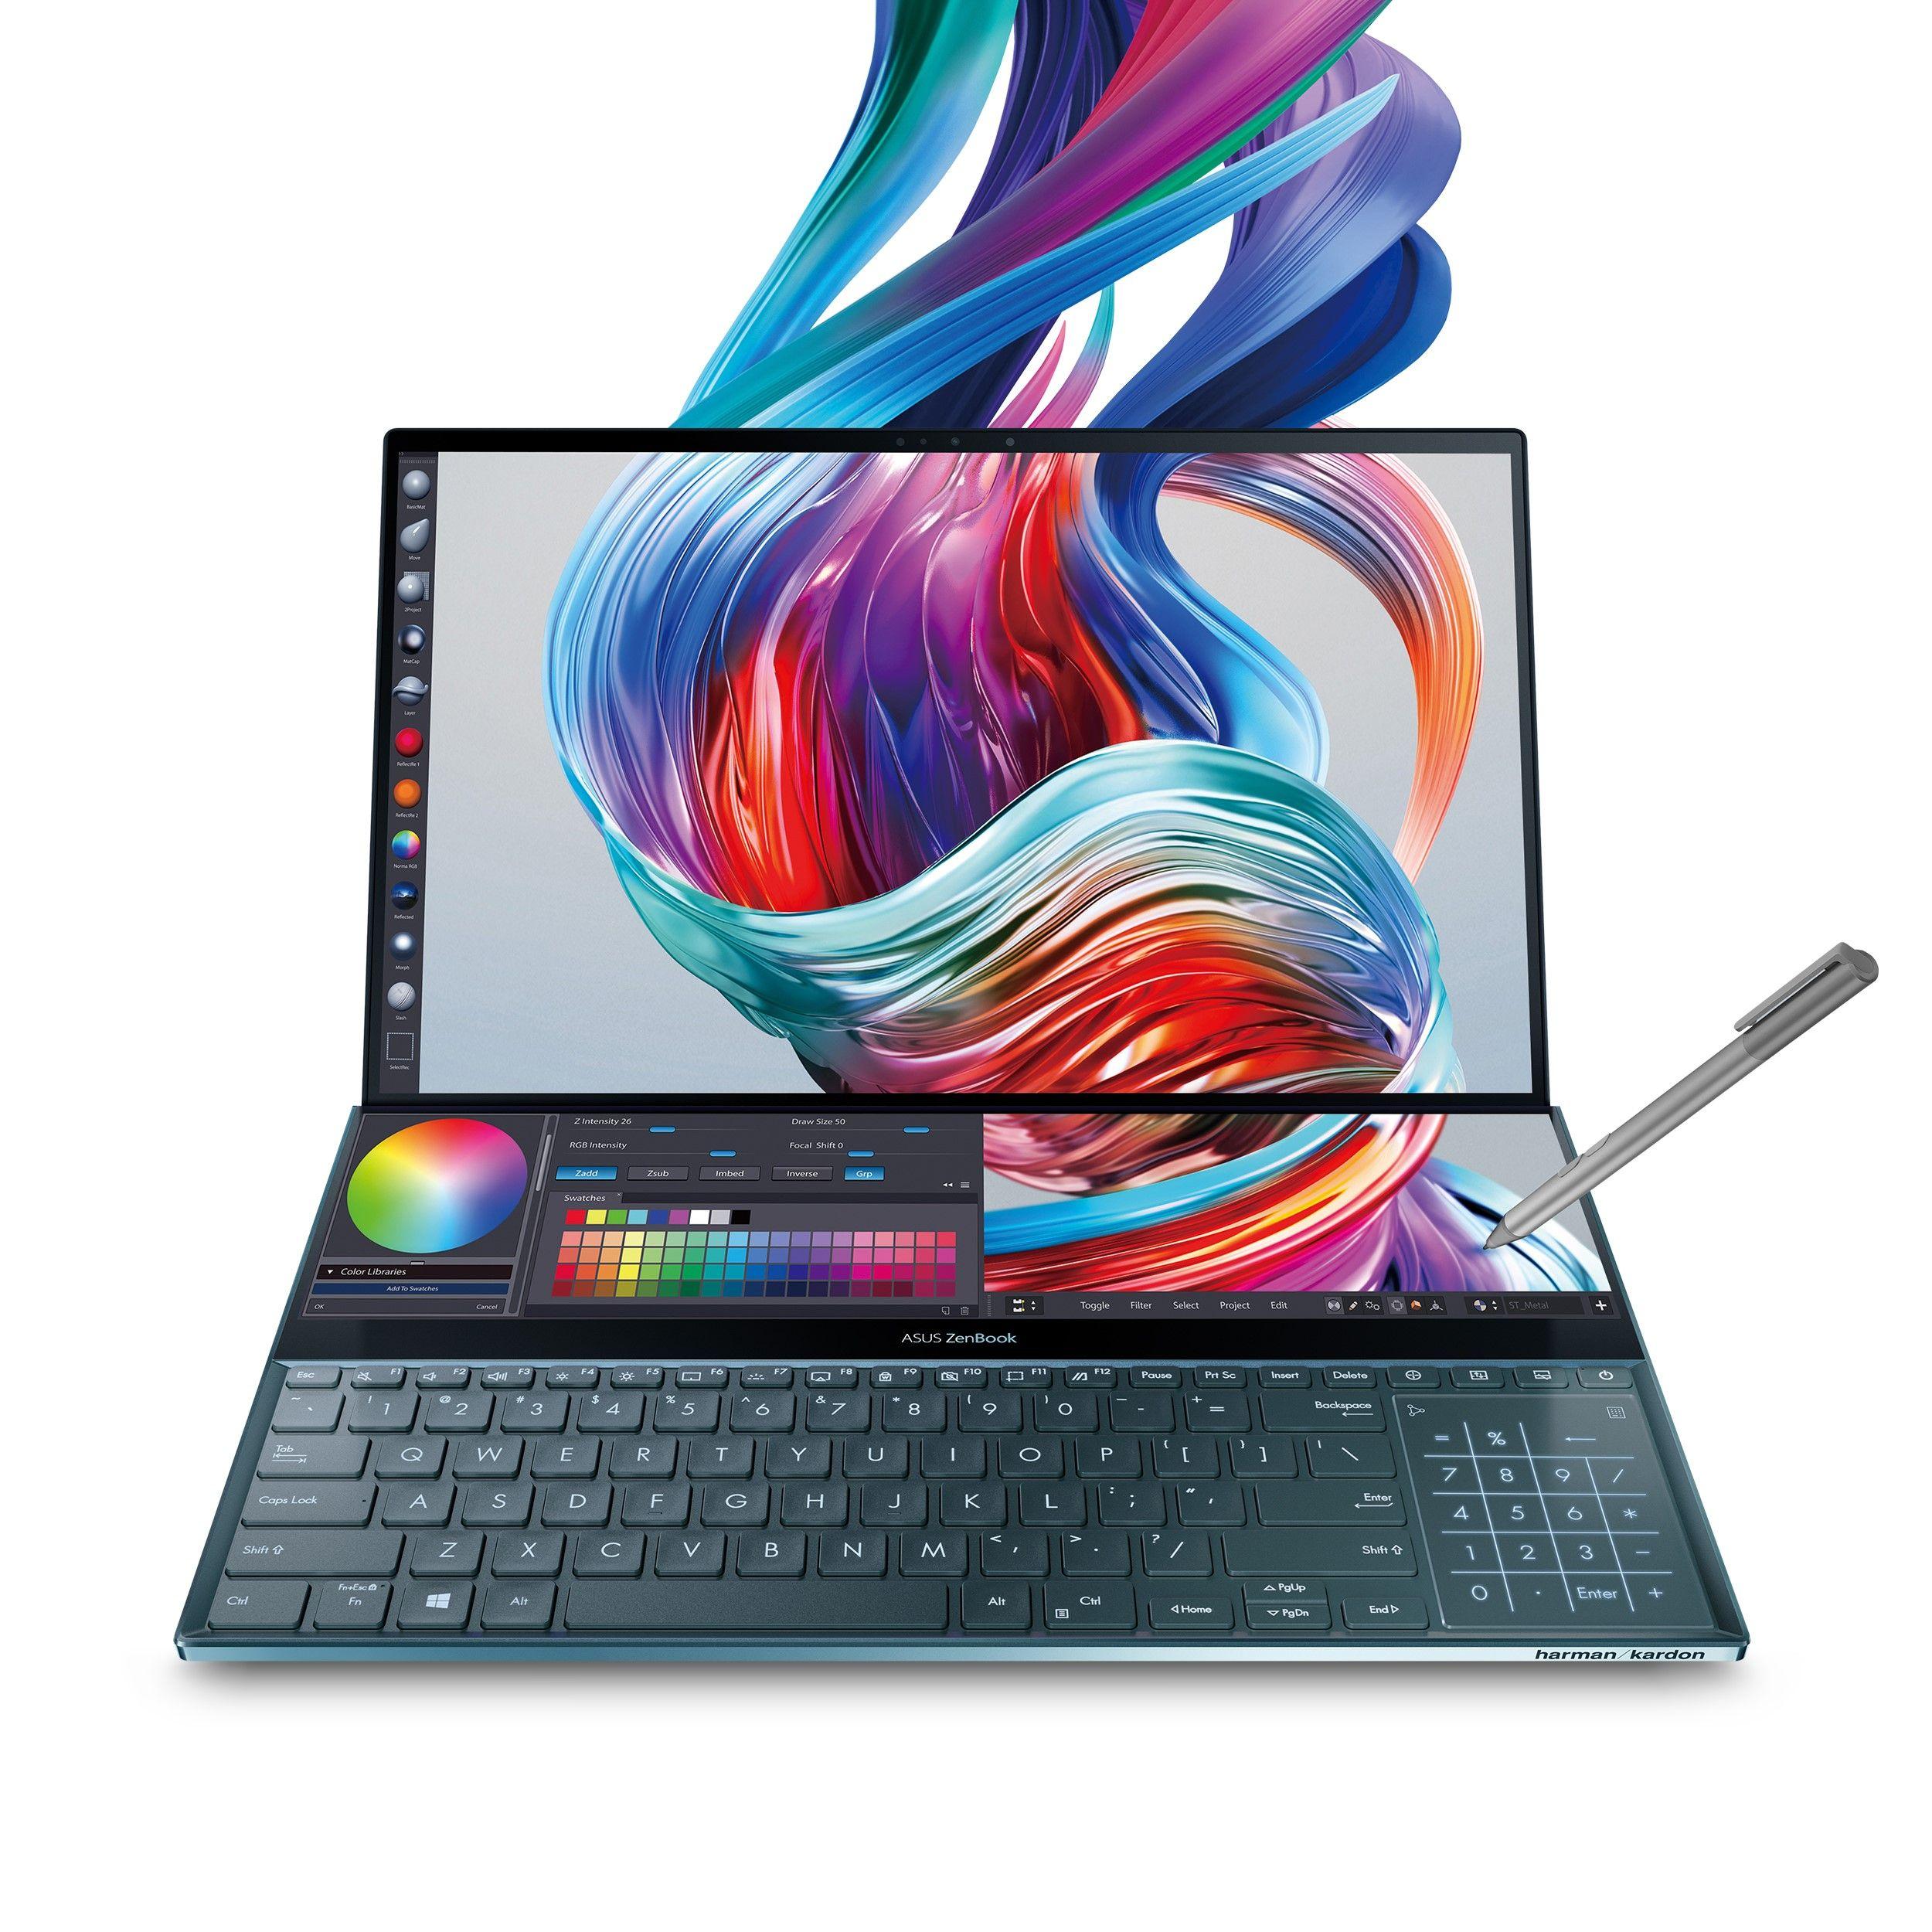 Asus Zenbook Pro Duo Ux581 15 6 4k Uhd Nanoedge Bezel Touch